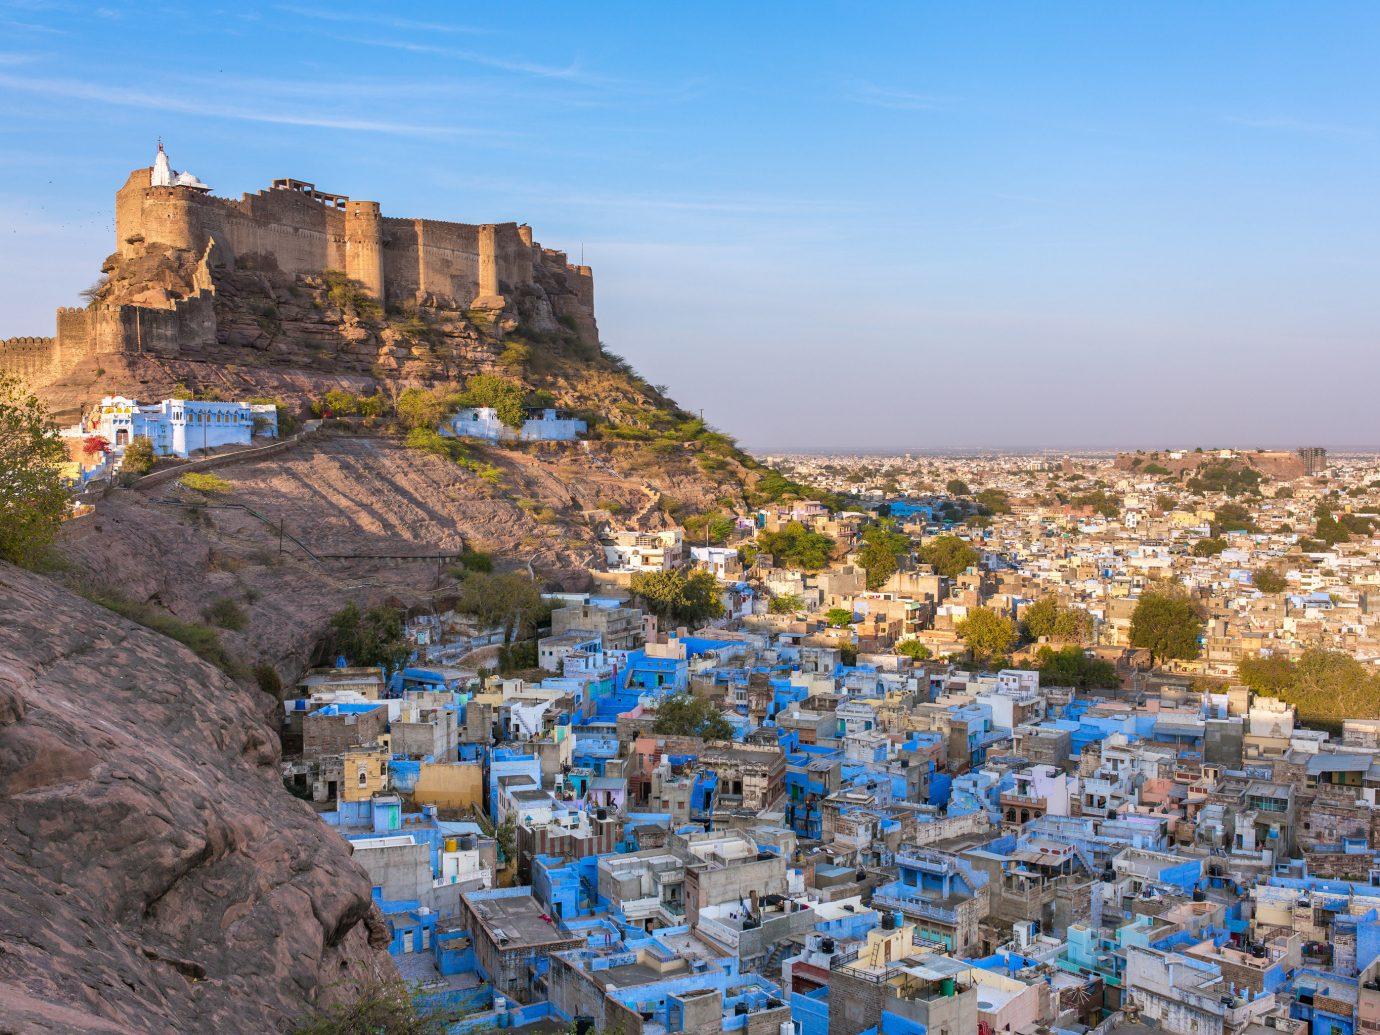 India Jaipur Jodhpur Trip Ideas outdoor sky City Town urban area rock Village Sea Coast tourism terrain tree mountain canyon hillside